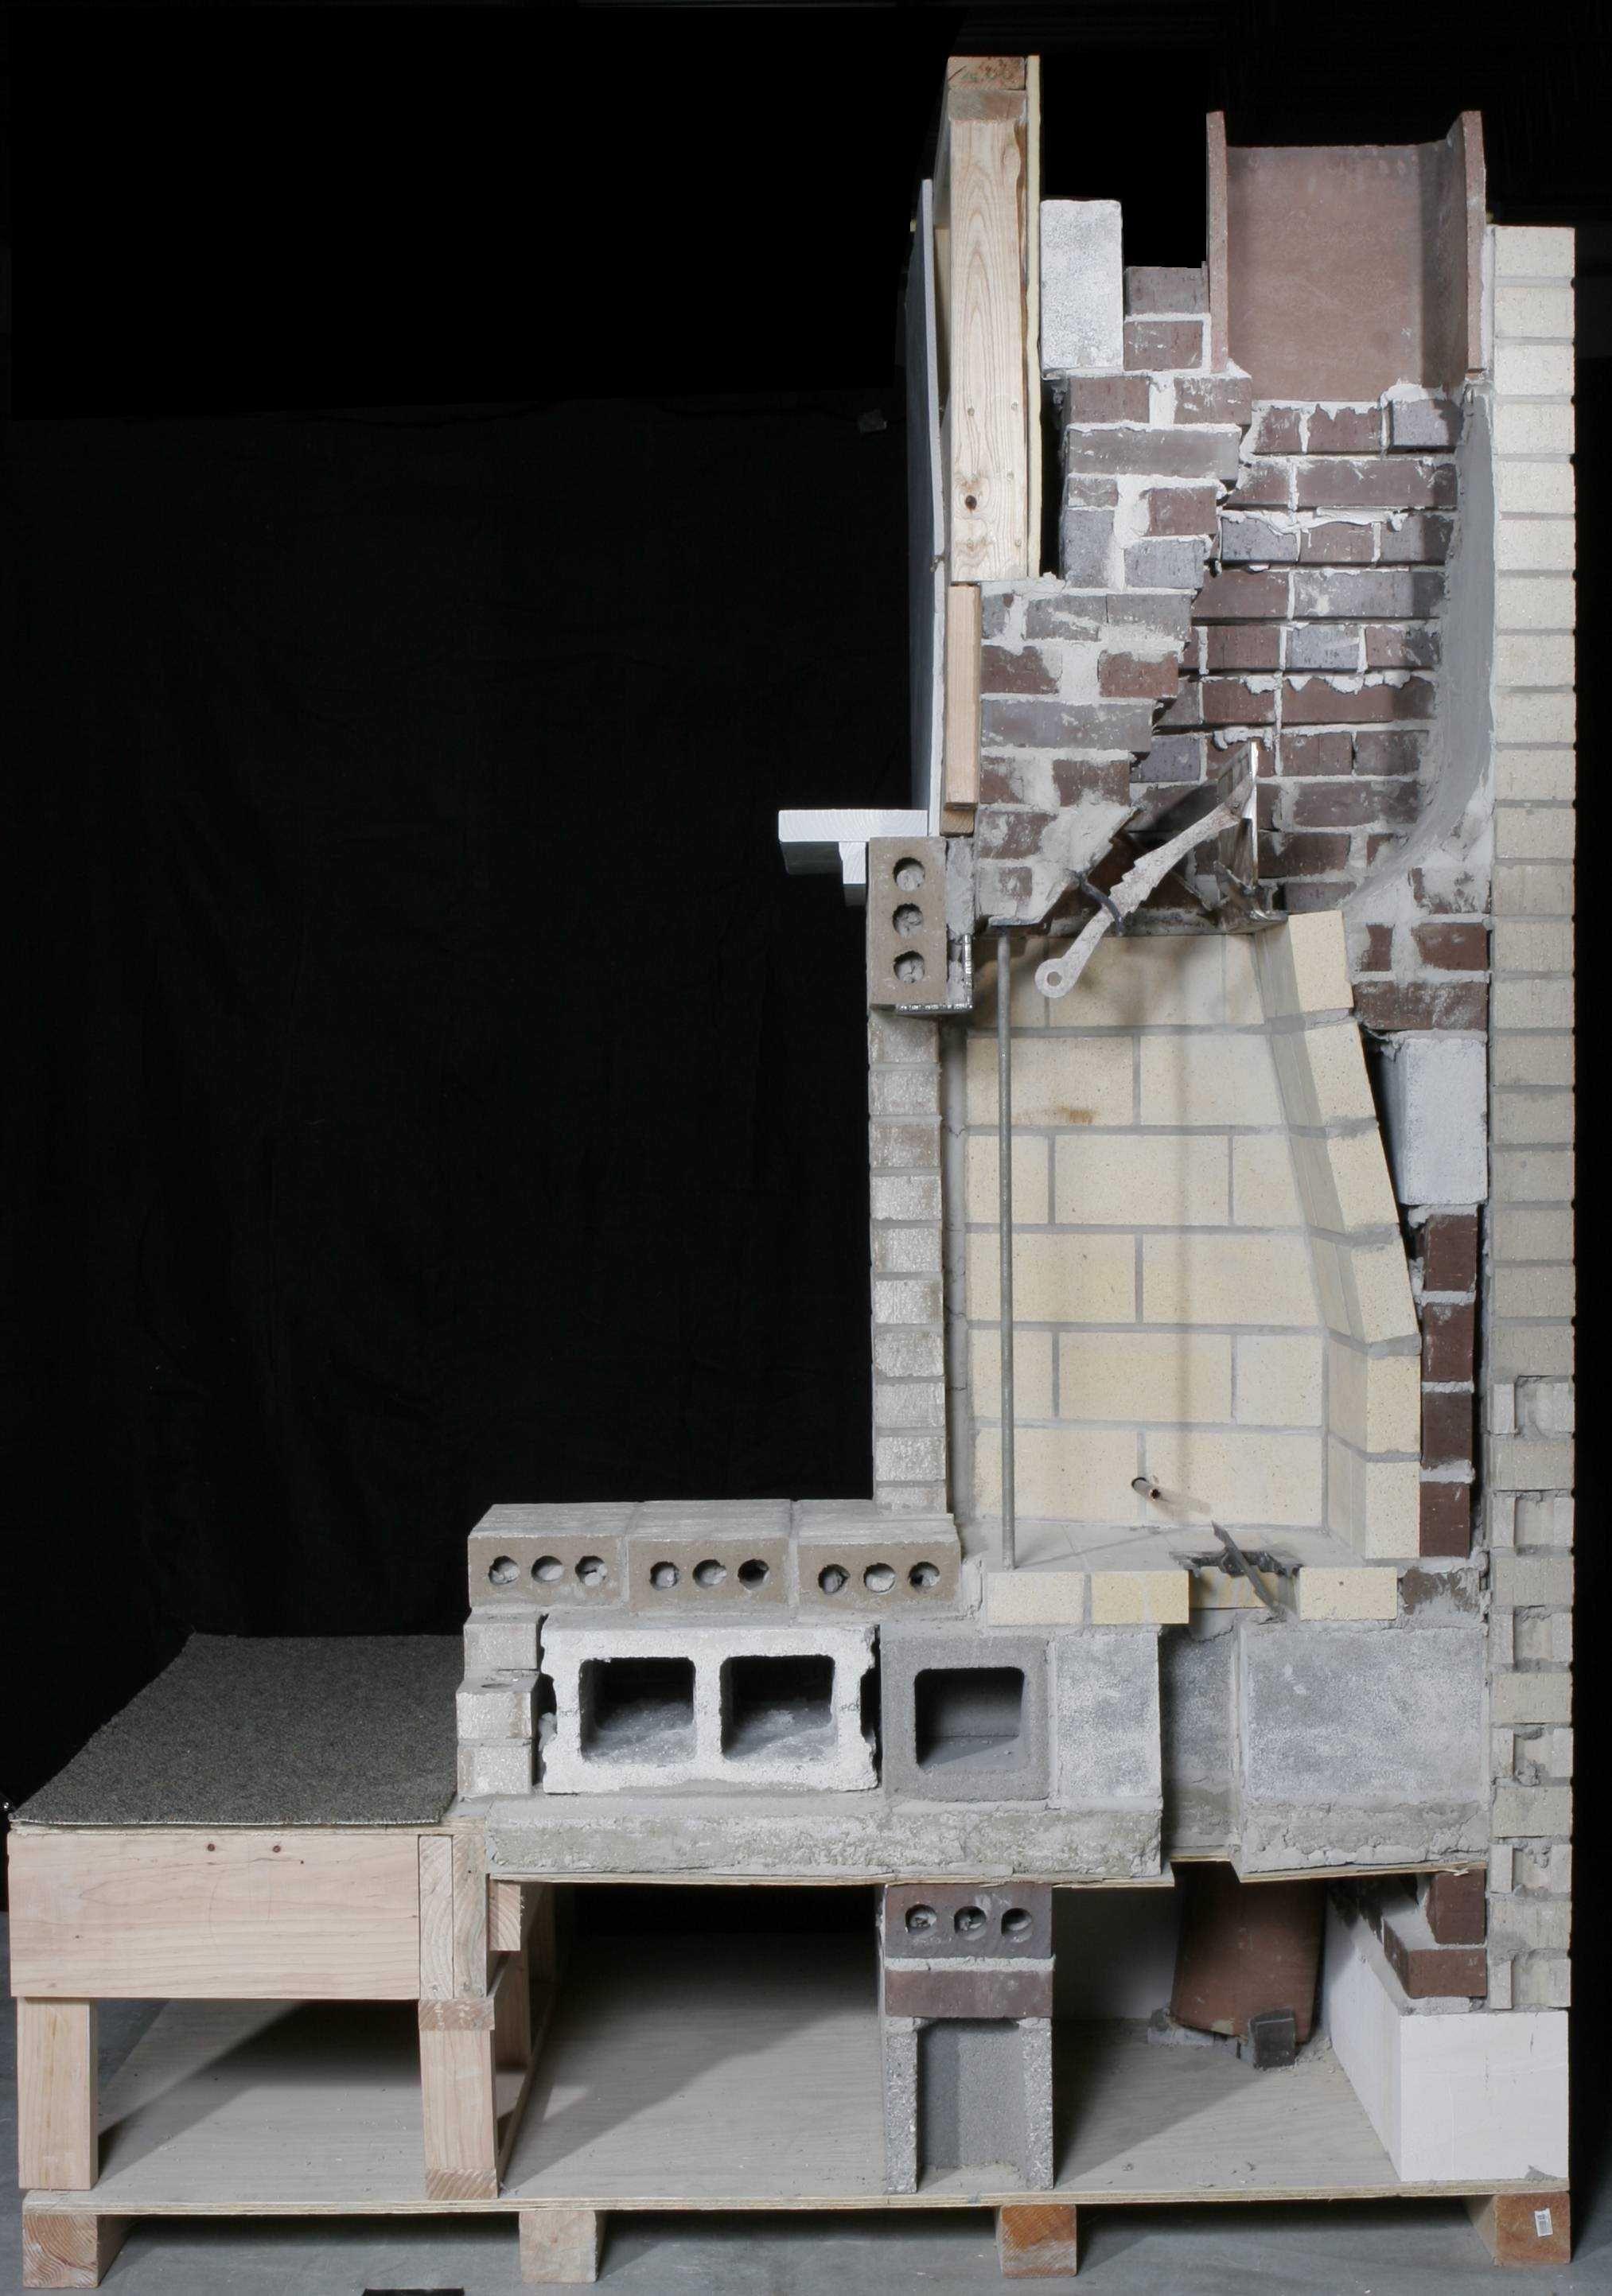 Best Fireplace Cutaway Jpg 2026 2886 Masonry Fireplace Diy Outdoor Fireplace Chimney Design